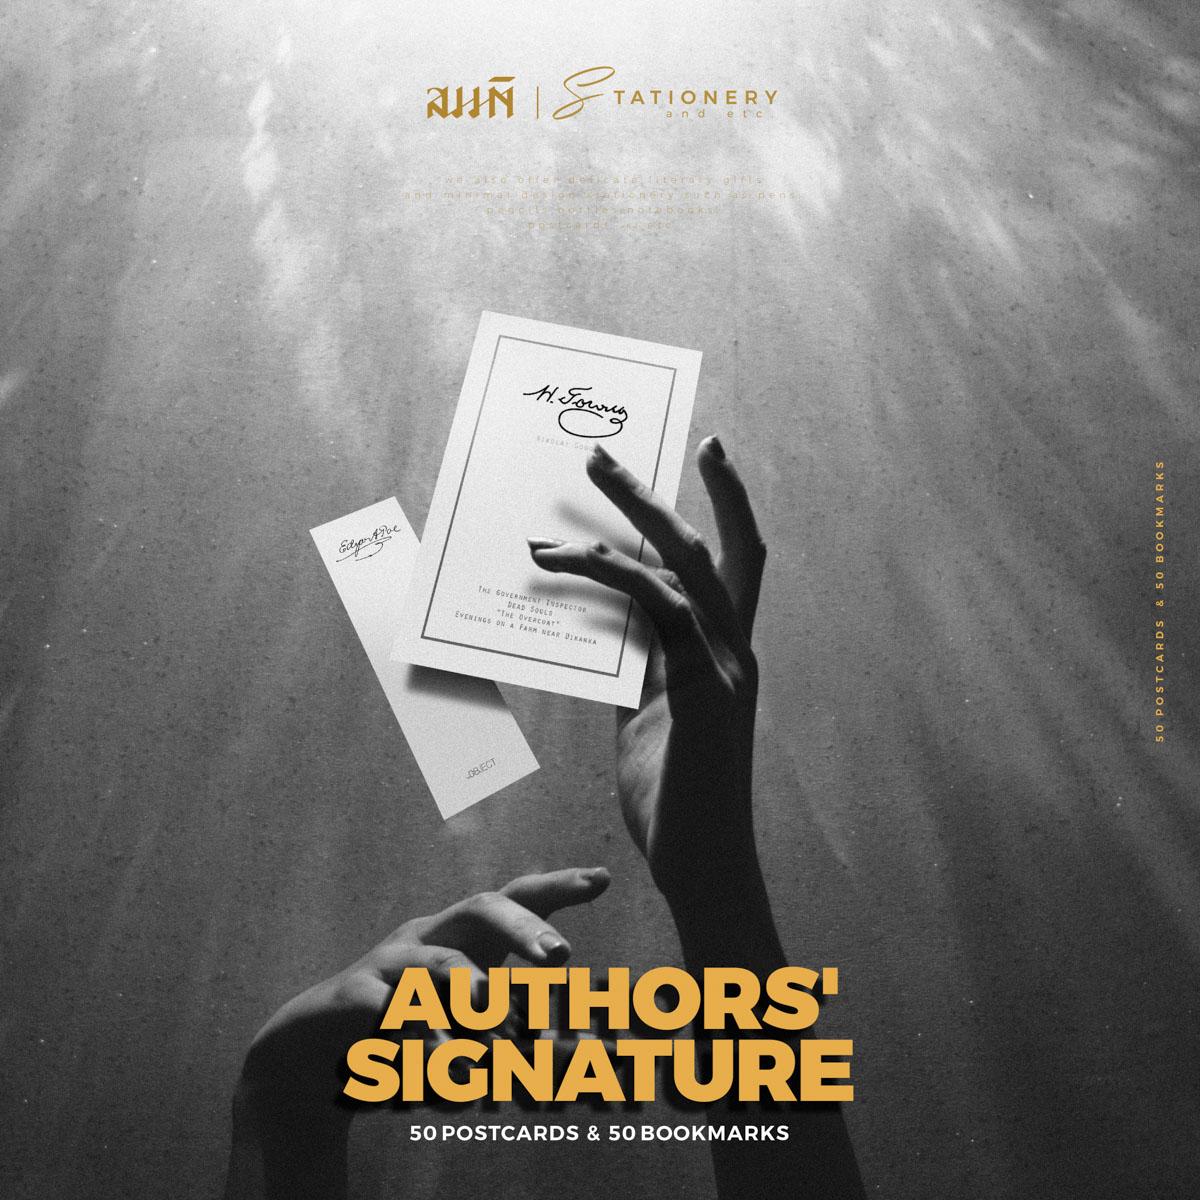 Postcard & Bookmark  ลายเซ็นผู้ประพันธ์ (Author's Signature)